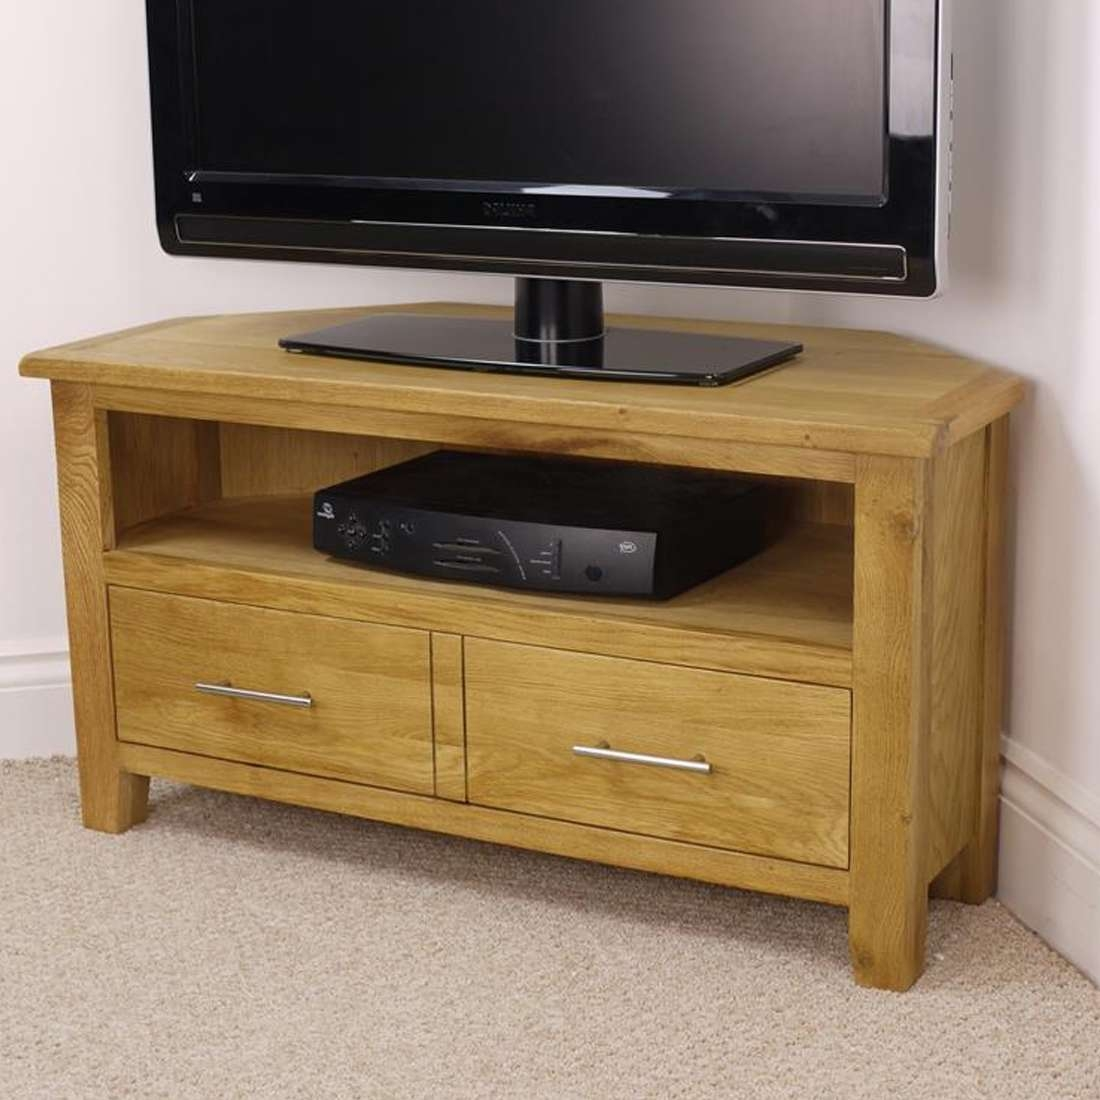 Nebraska Modern Oak Corner Tv Unit / Solid Wood Tv Stand / Oiled With Regard To Wooden Corner Tv Cabinets (View 11 of 20)